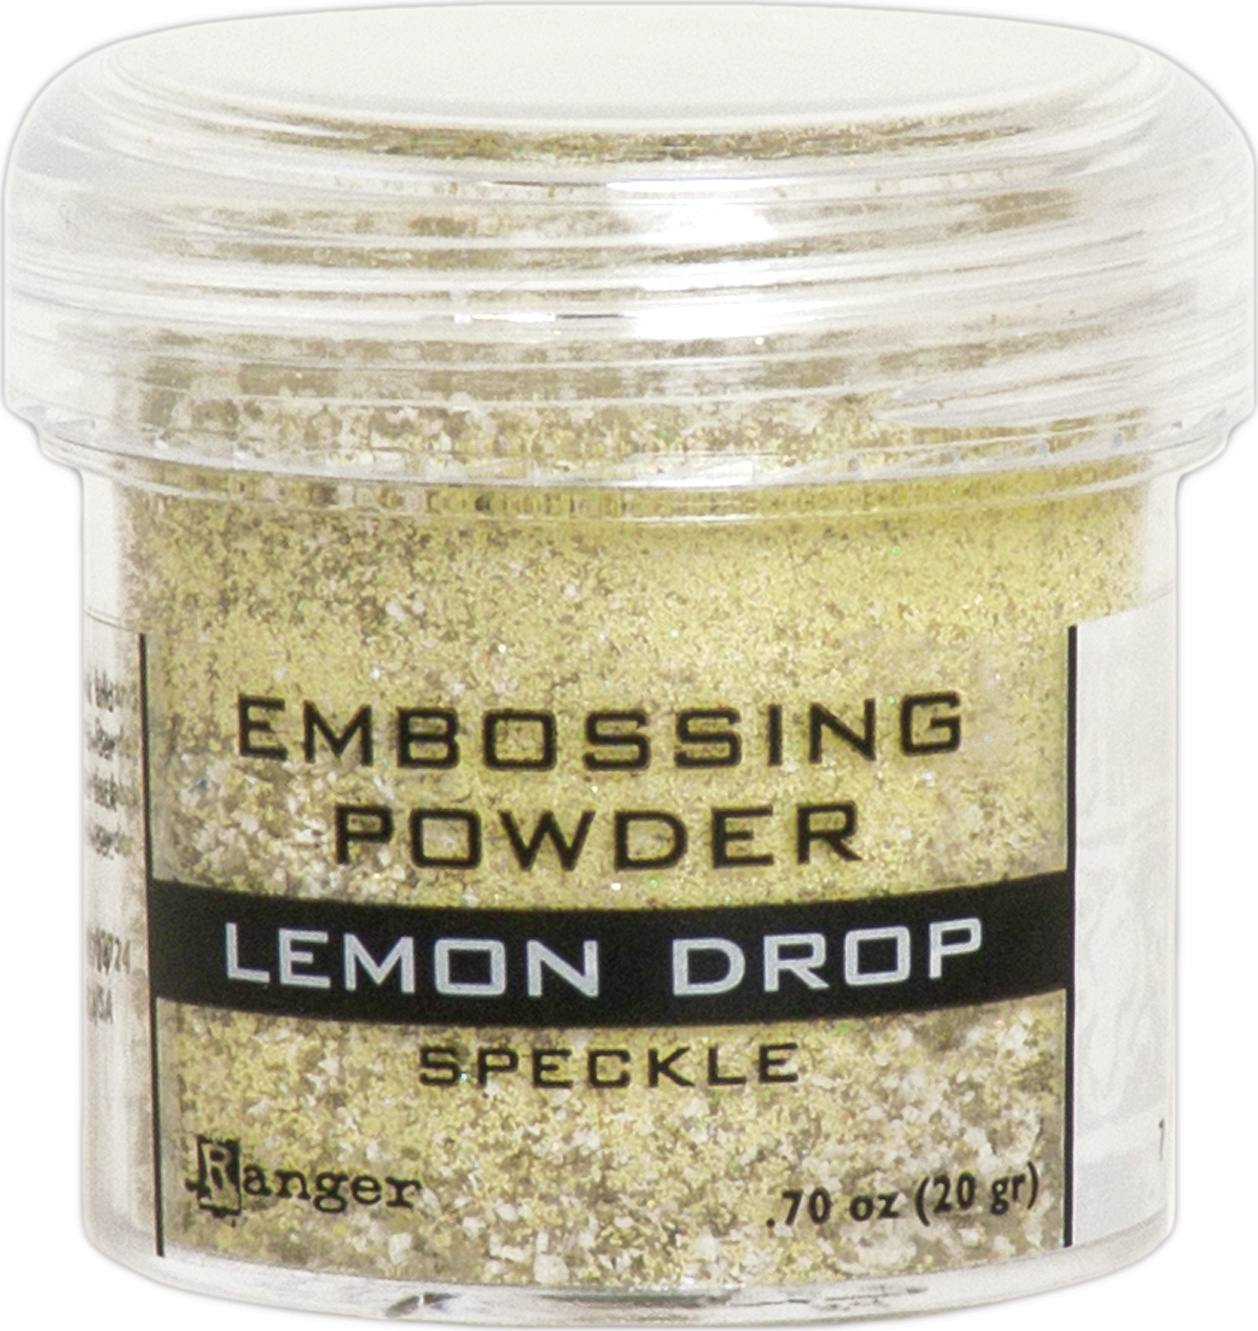 Ranger Embossing Powder-Lemon Drop